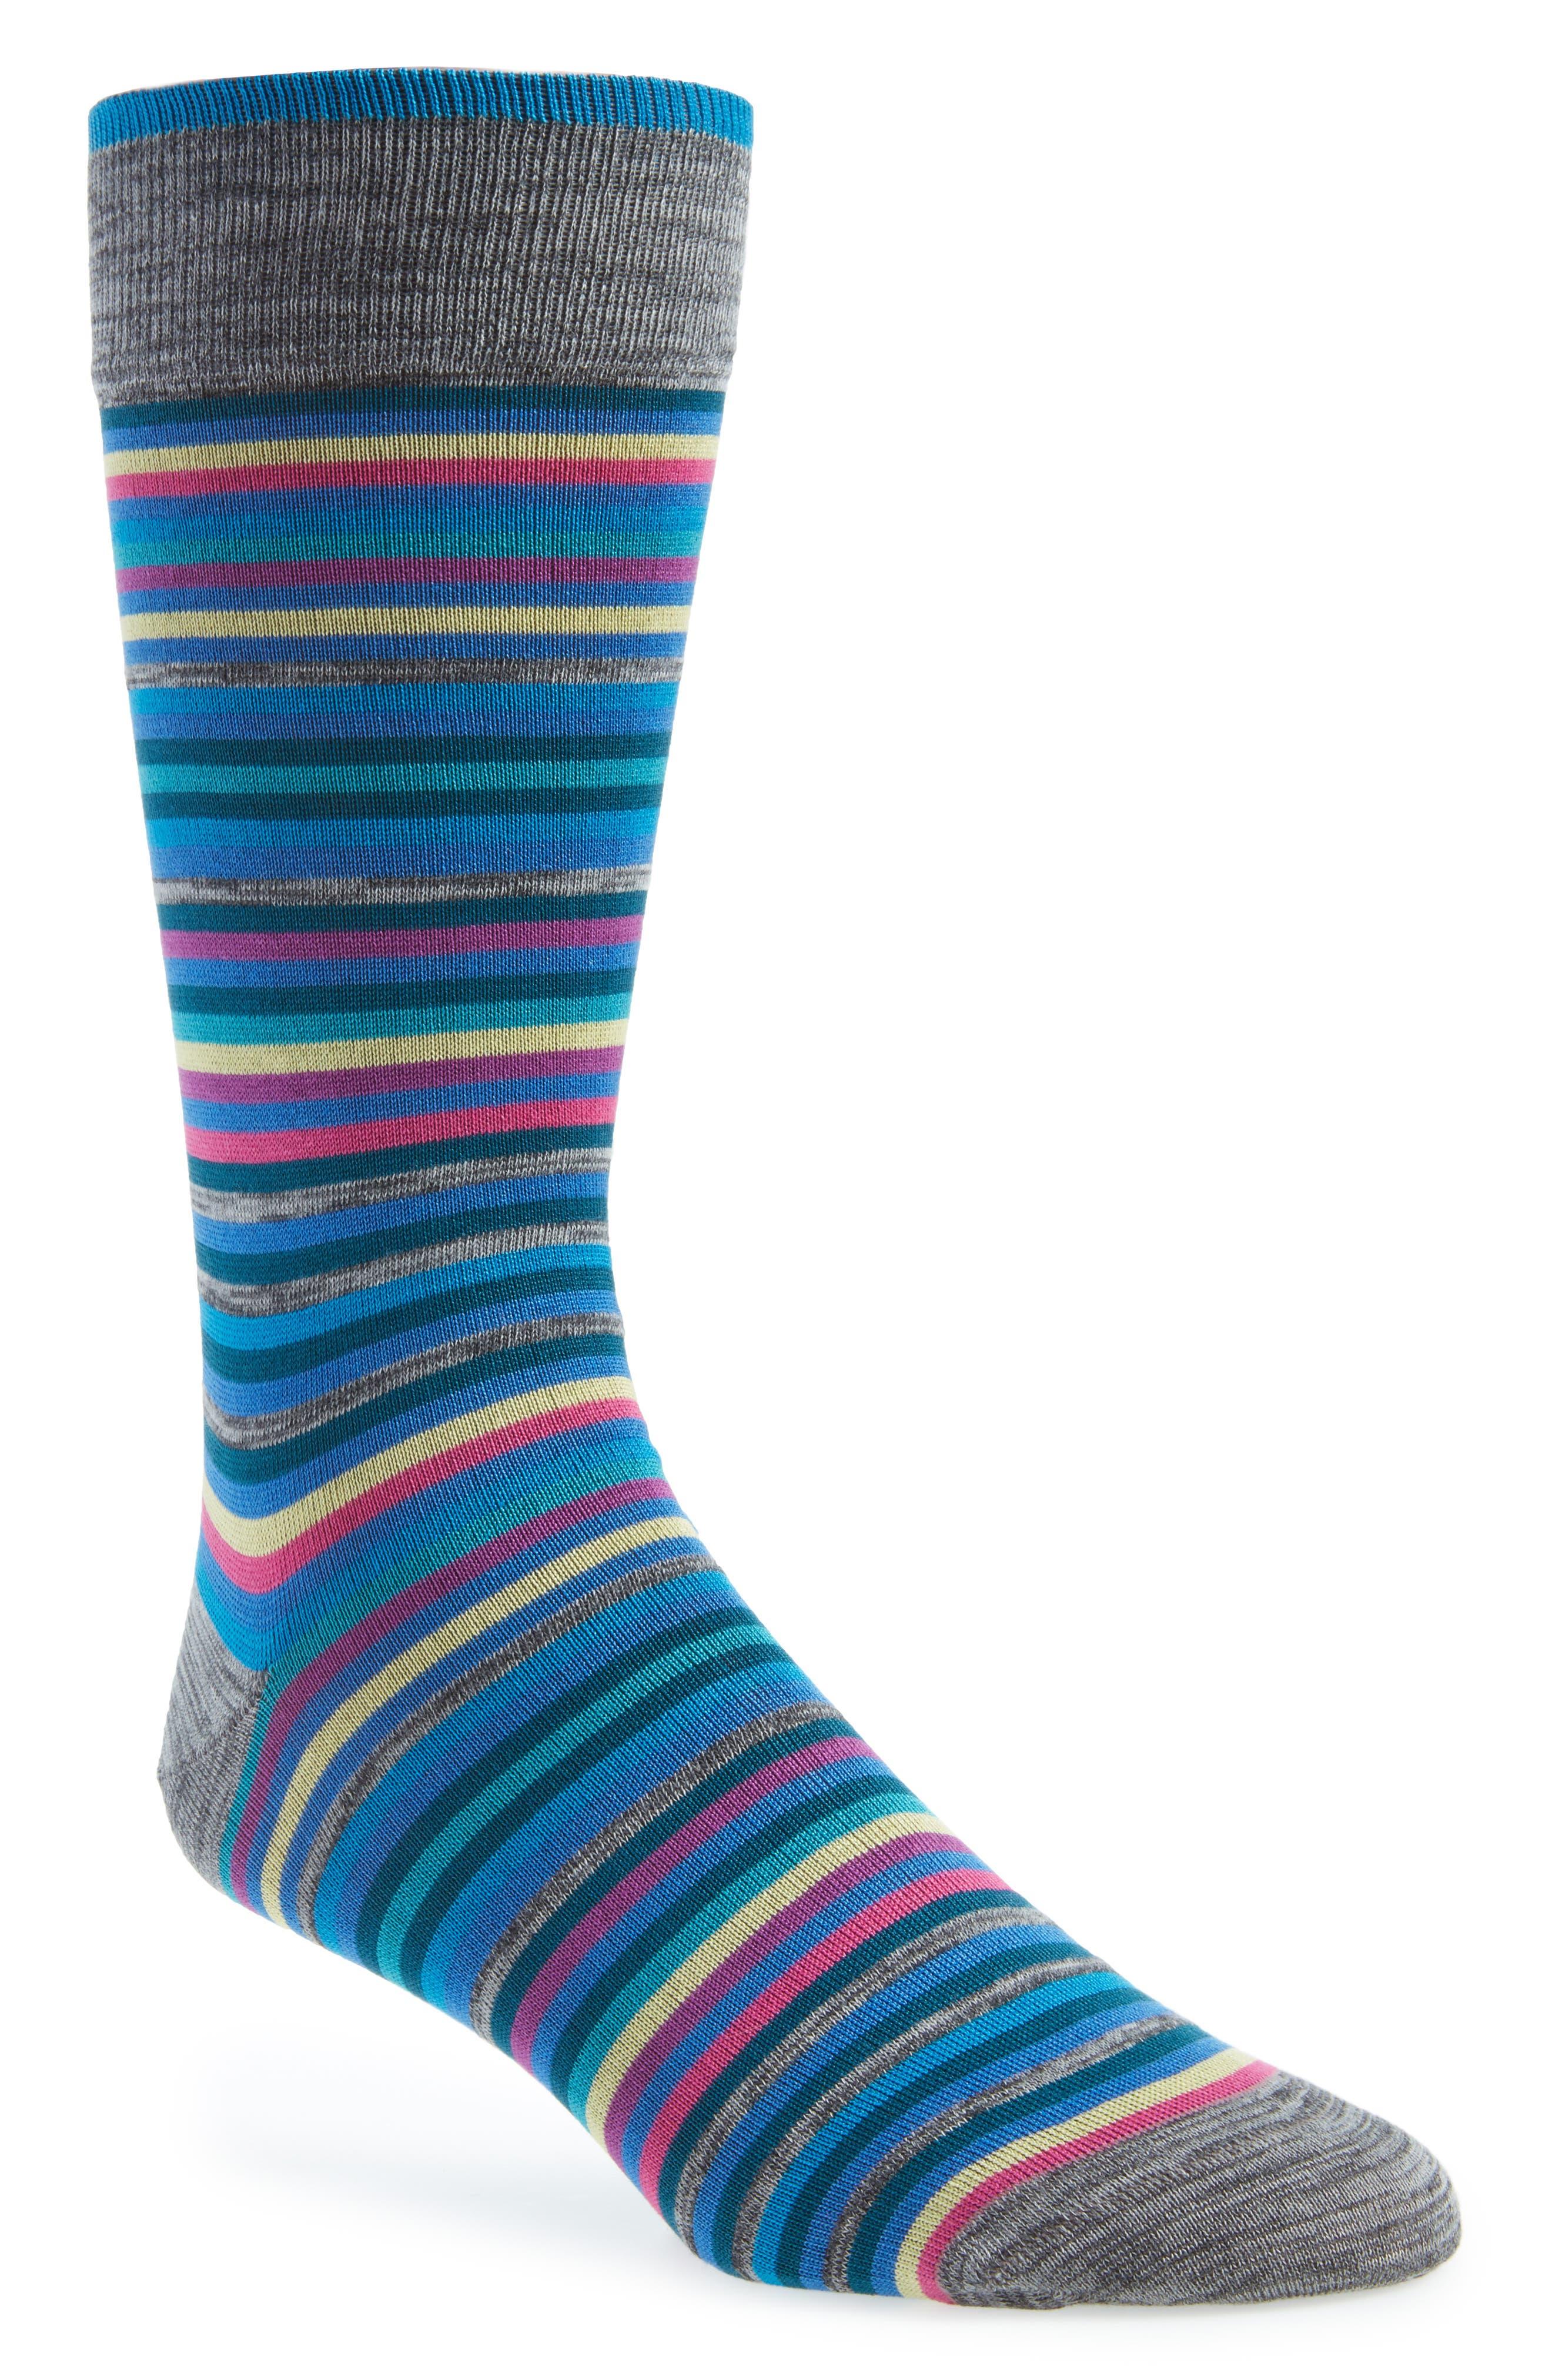 Stripe Mercerized Cotton Blend Socks,                         Main,                         color, 040